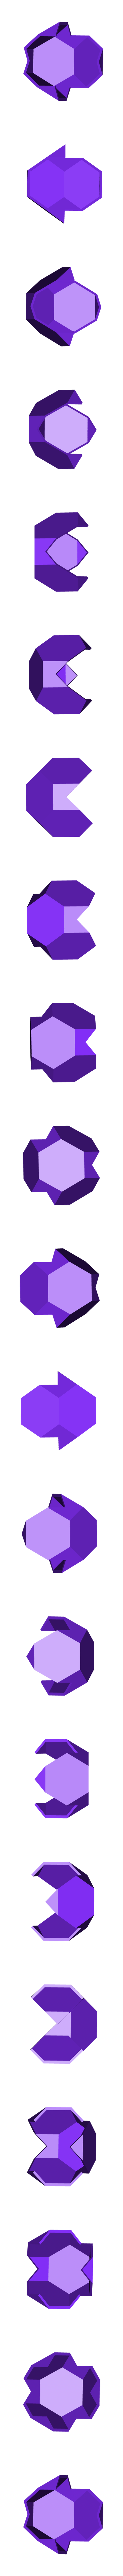 halfTruncatedOctaH_Shell_50mm.stl Download free STL file Half Truncated Octahedron • 3D printing template, LGBU